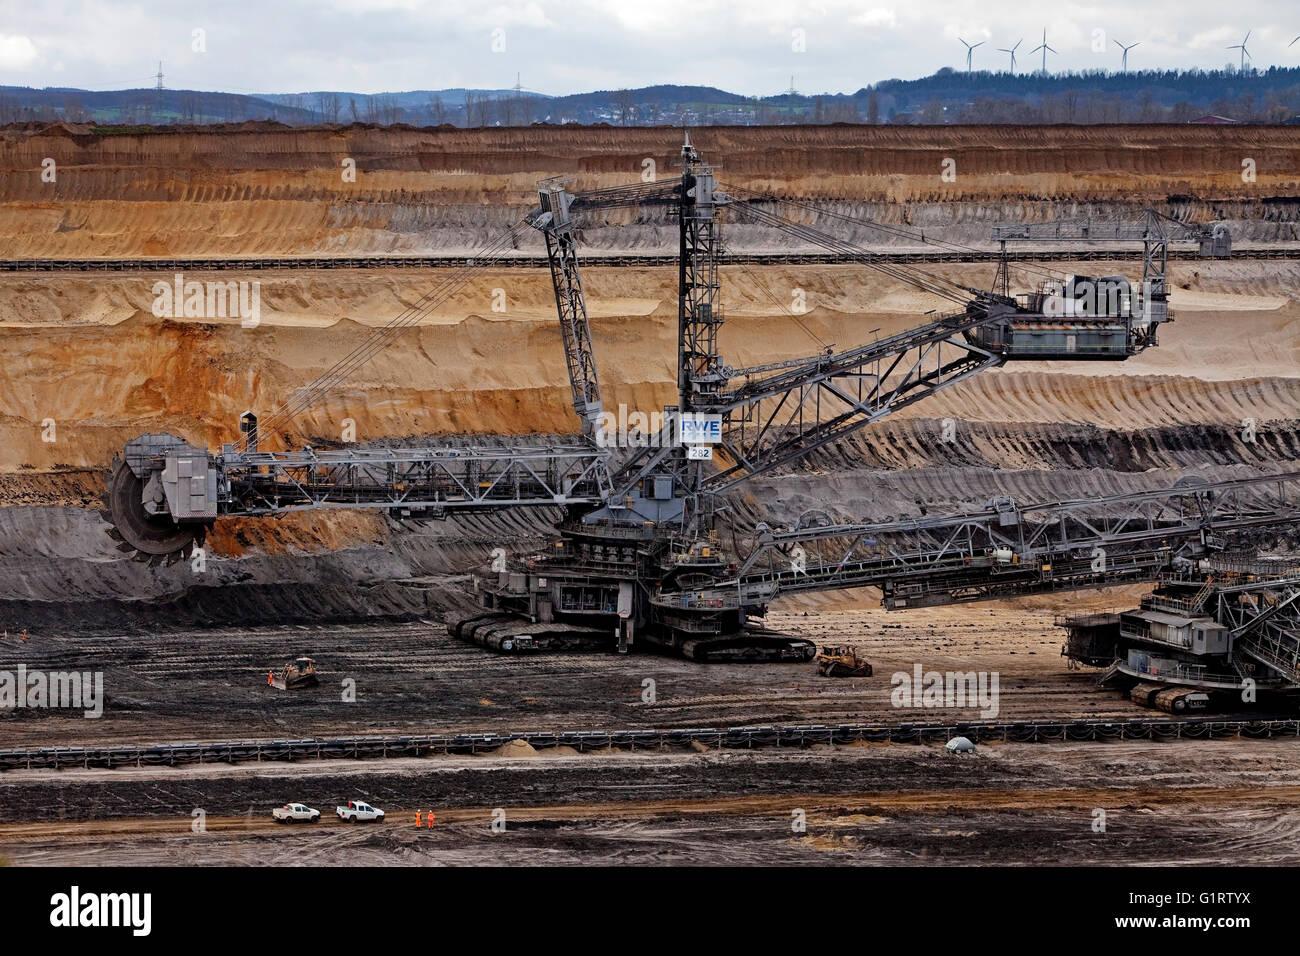 Bucket wheel excavators 282 in Inden opencast mine, lignite mining, Inden, Rhenish lignite mining area, North Rhine Stock Photo